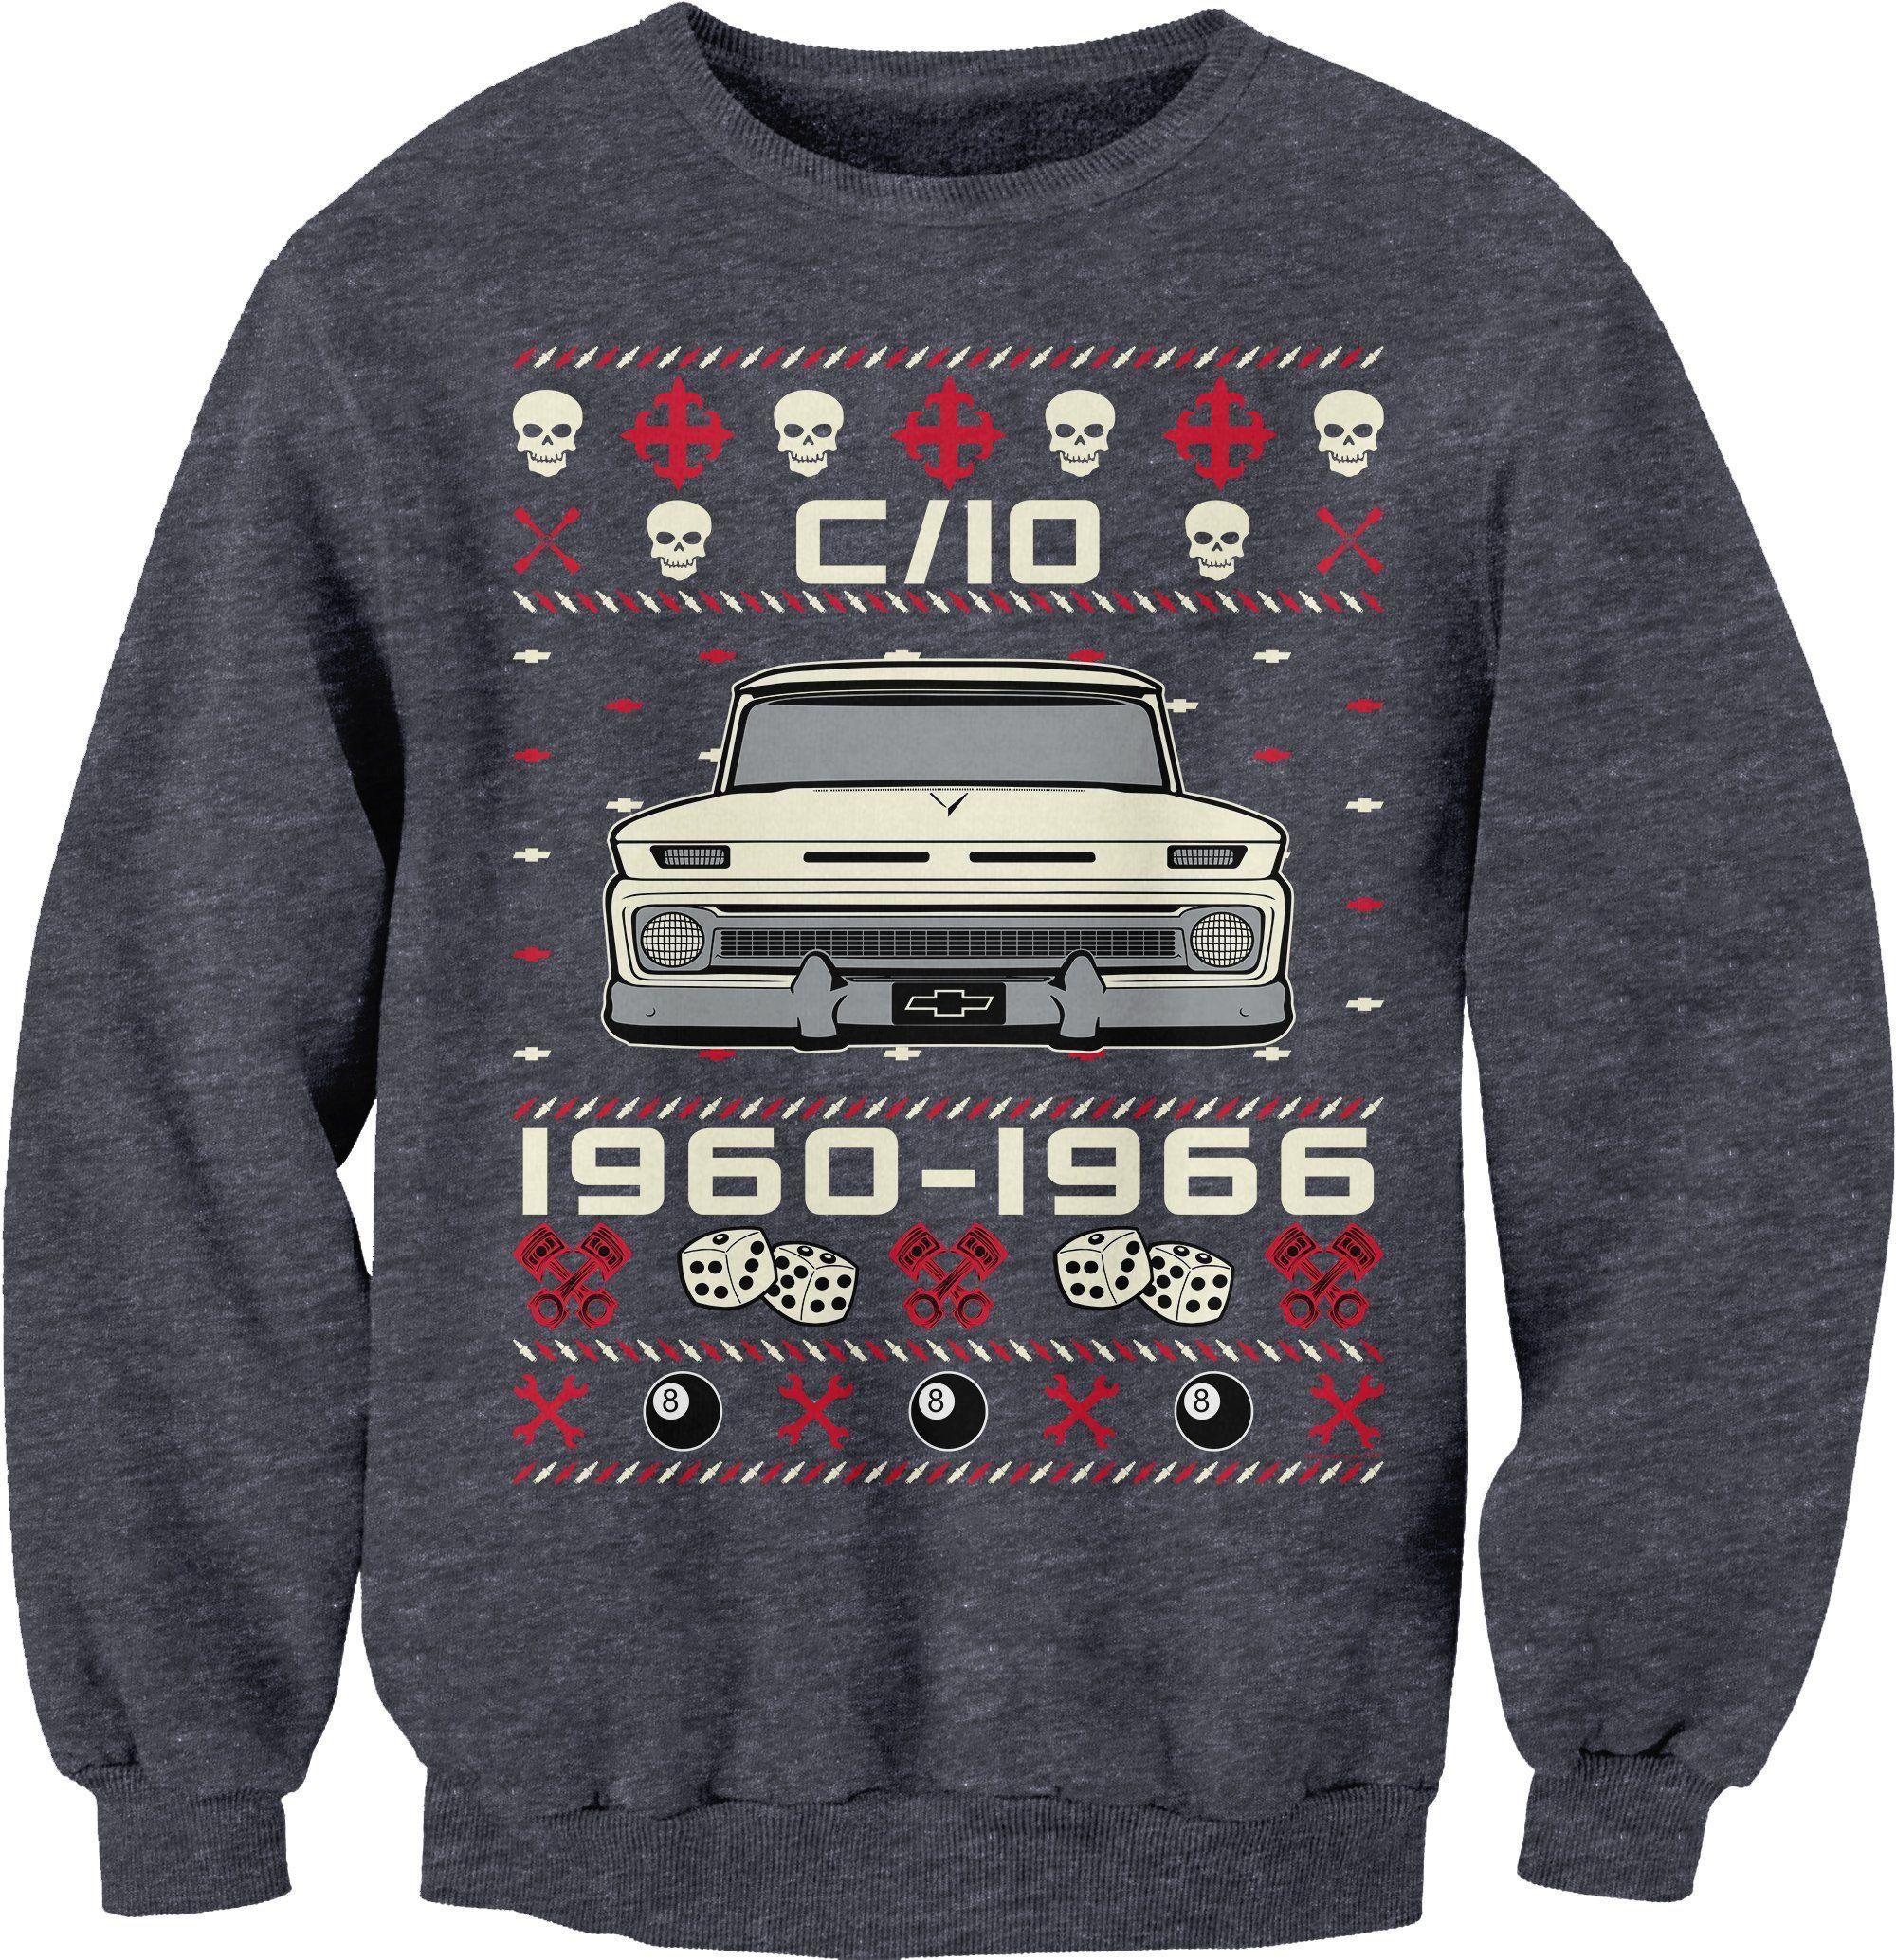 1960 1966 Chevy C10 Grumpy Christmas Sweater Style Sweat Shirt Sweatshirts Funny Christmas Sweaters Christmas Sweaters [ 2067 x 2000 Pixel ]